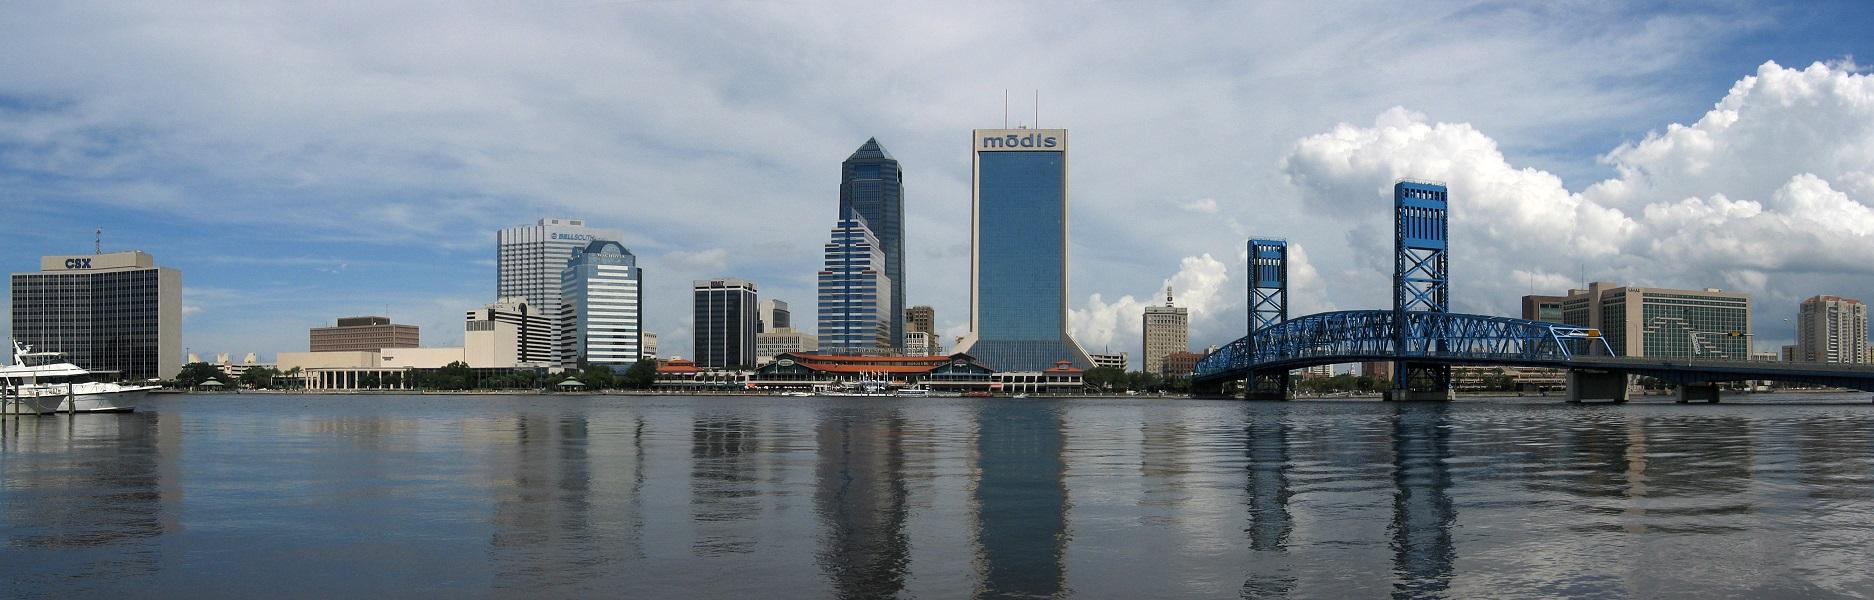 Atlantic Beach Real Estate: Jacksonville Suburb Guide